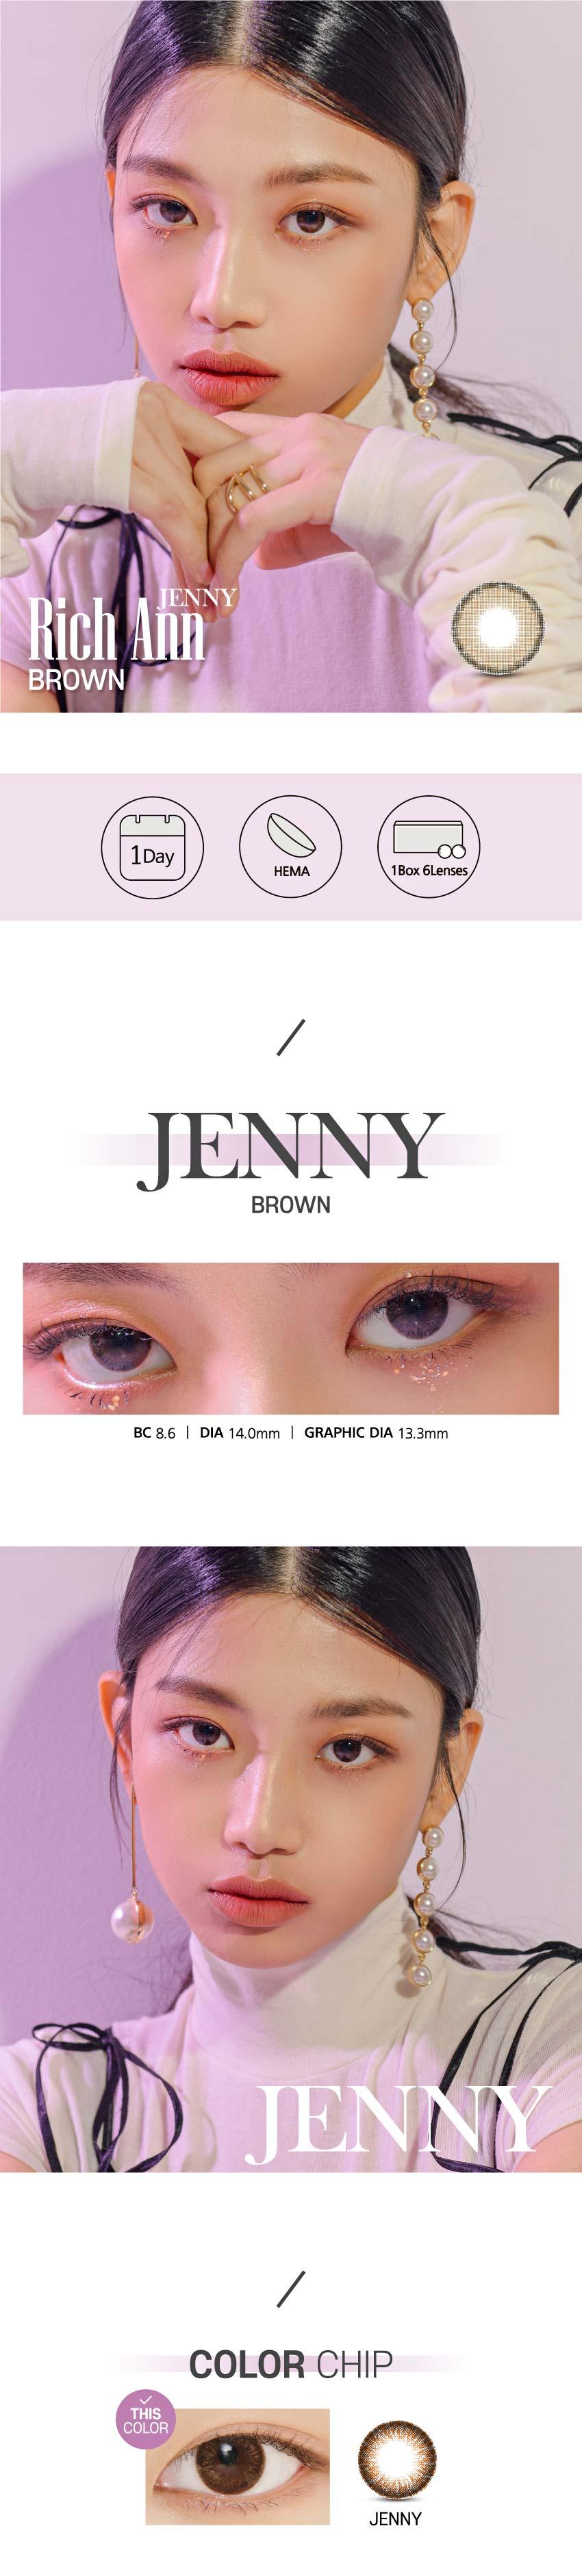 rich-ann-jenny-brown-korean-colored-lenses.jpg